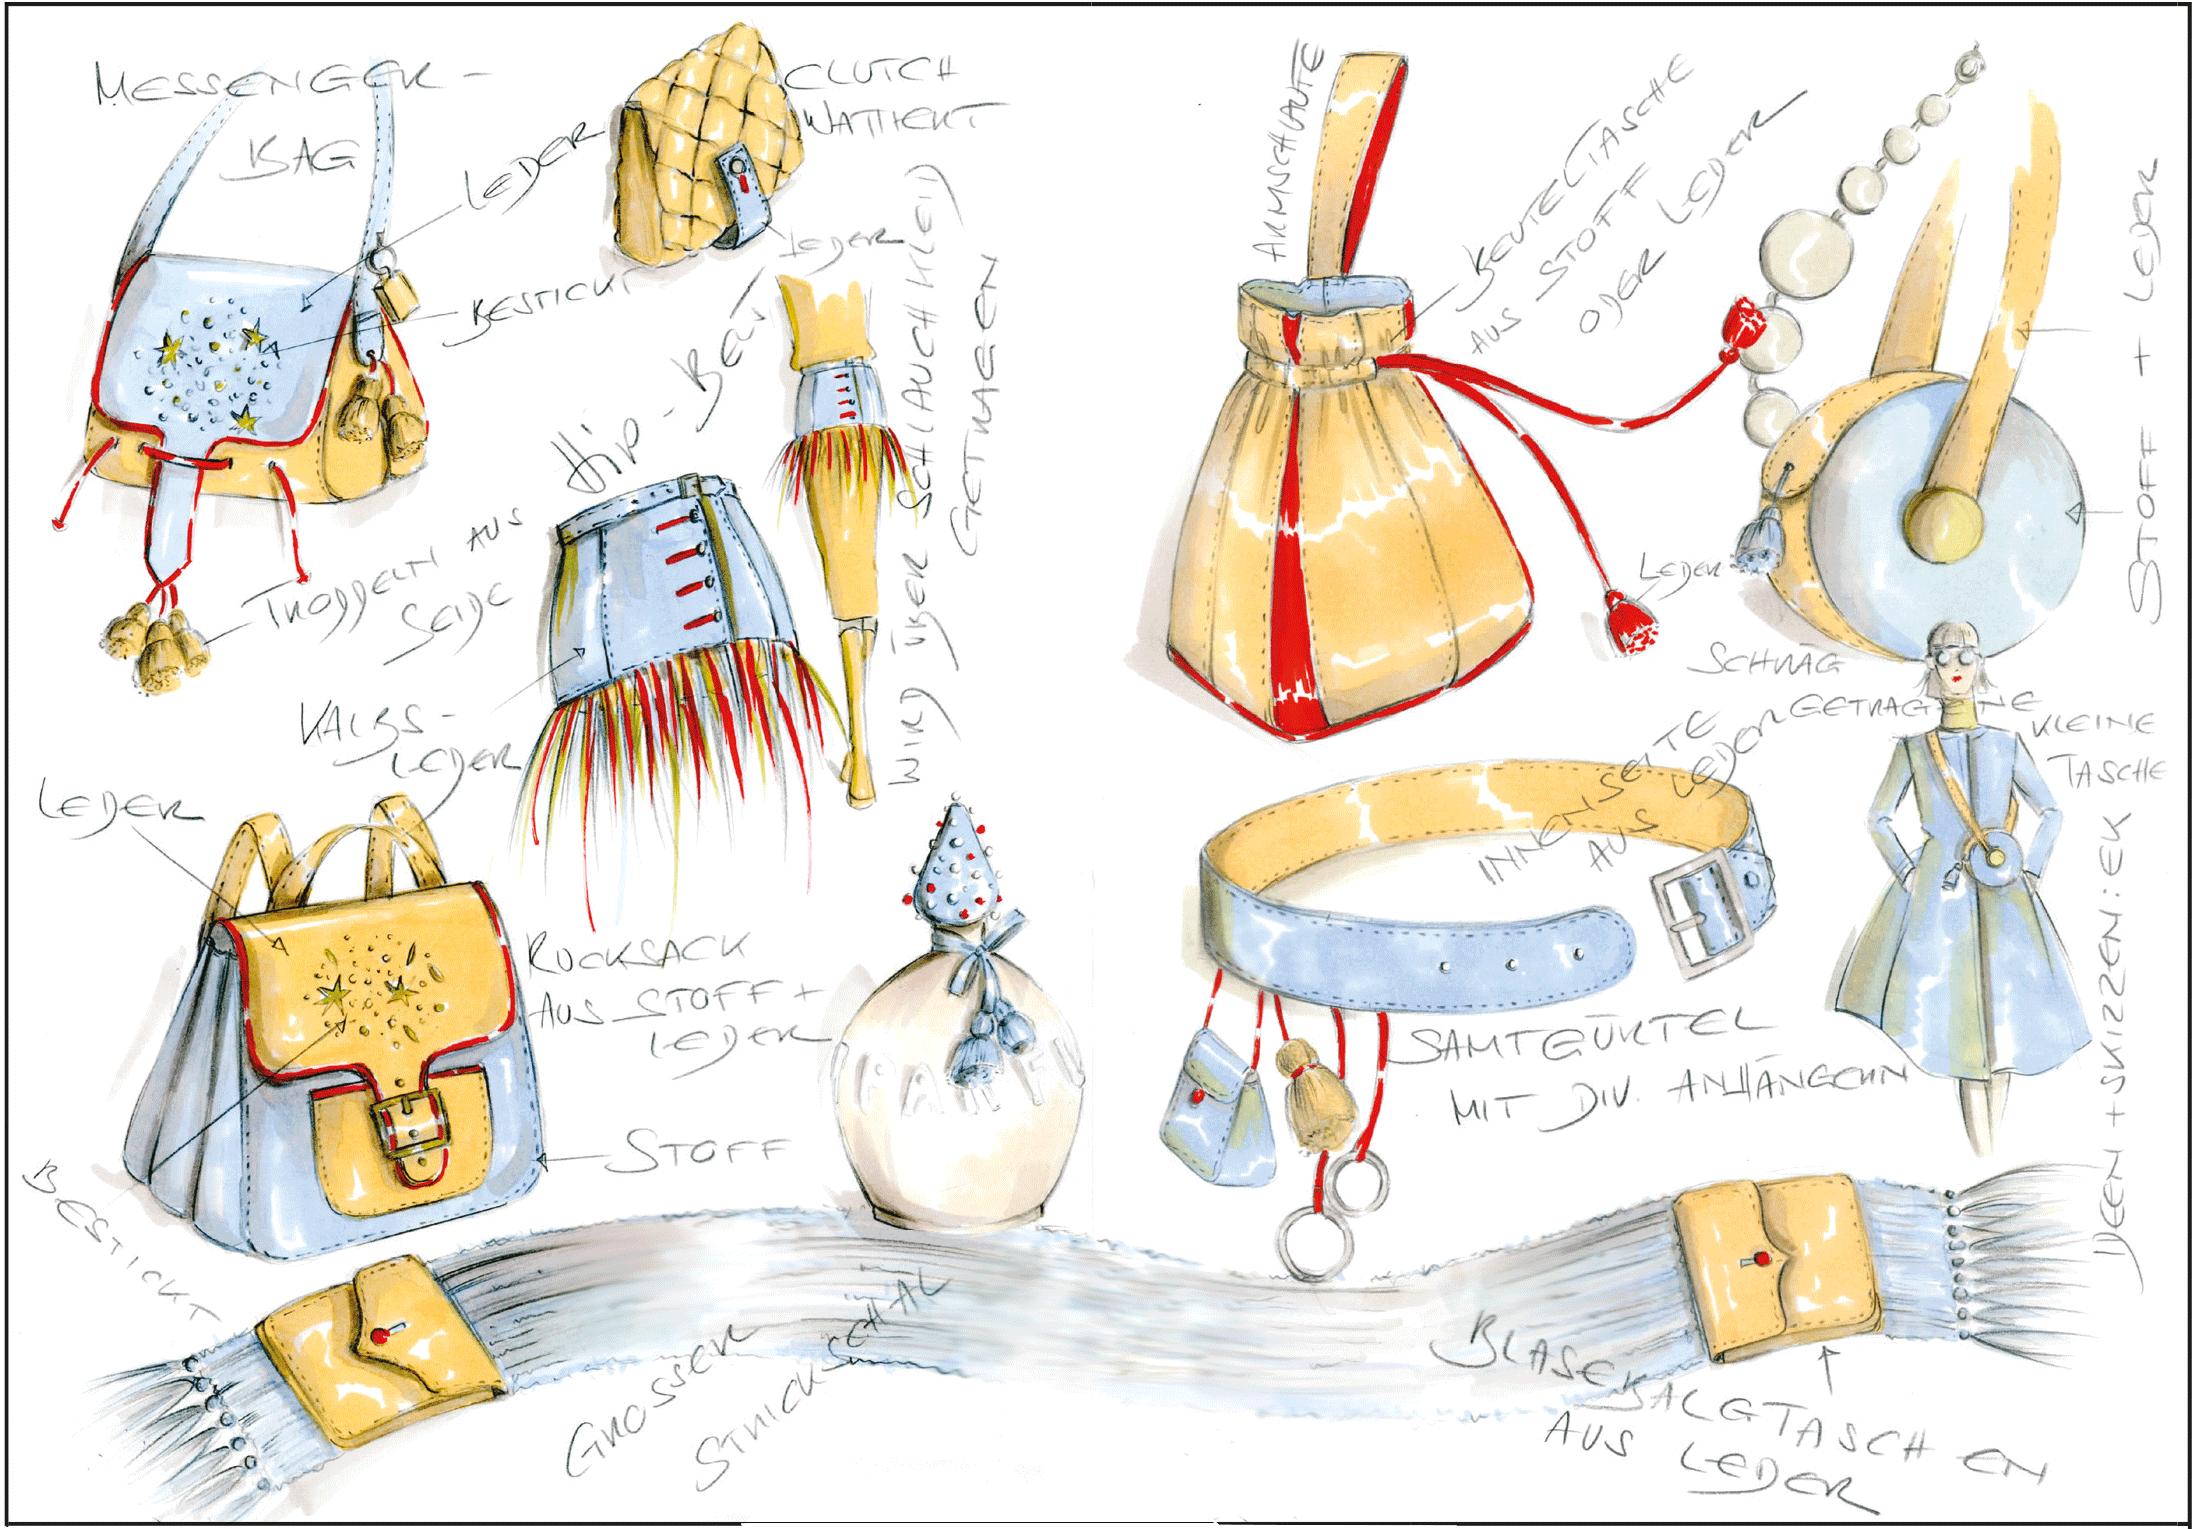 Accessoires: Taschen, Gürtel, Rucksack nähen